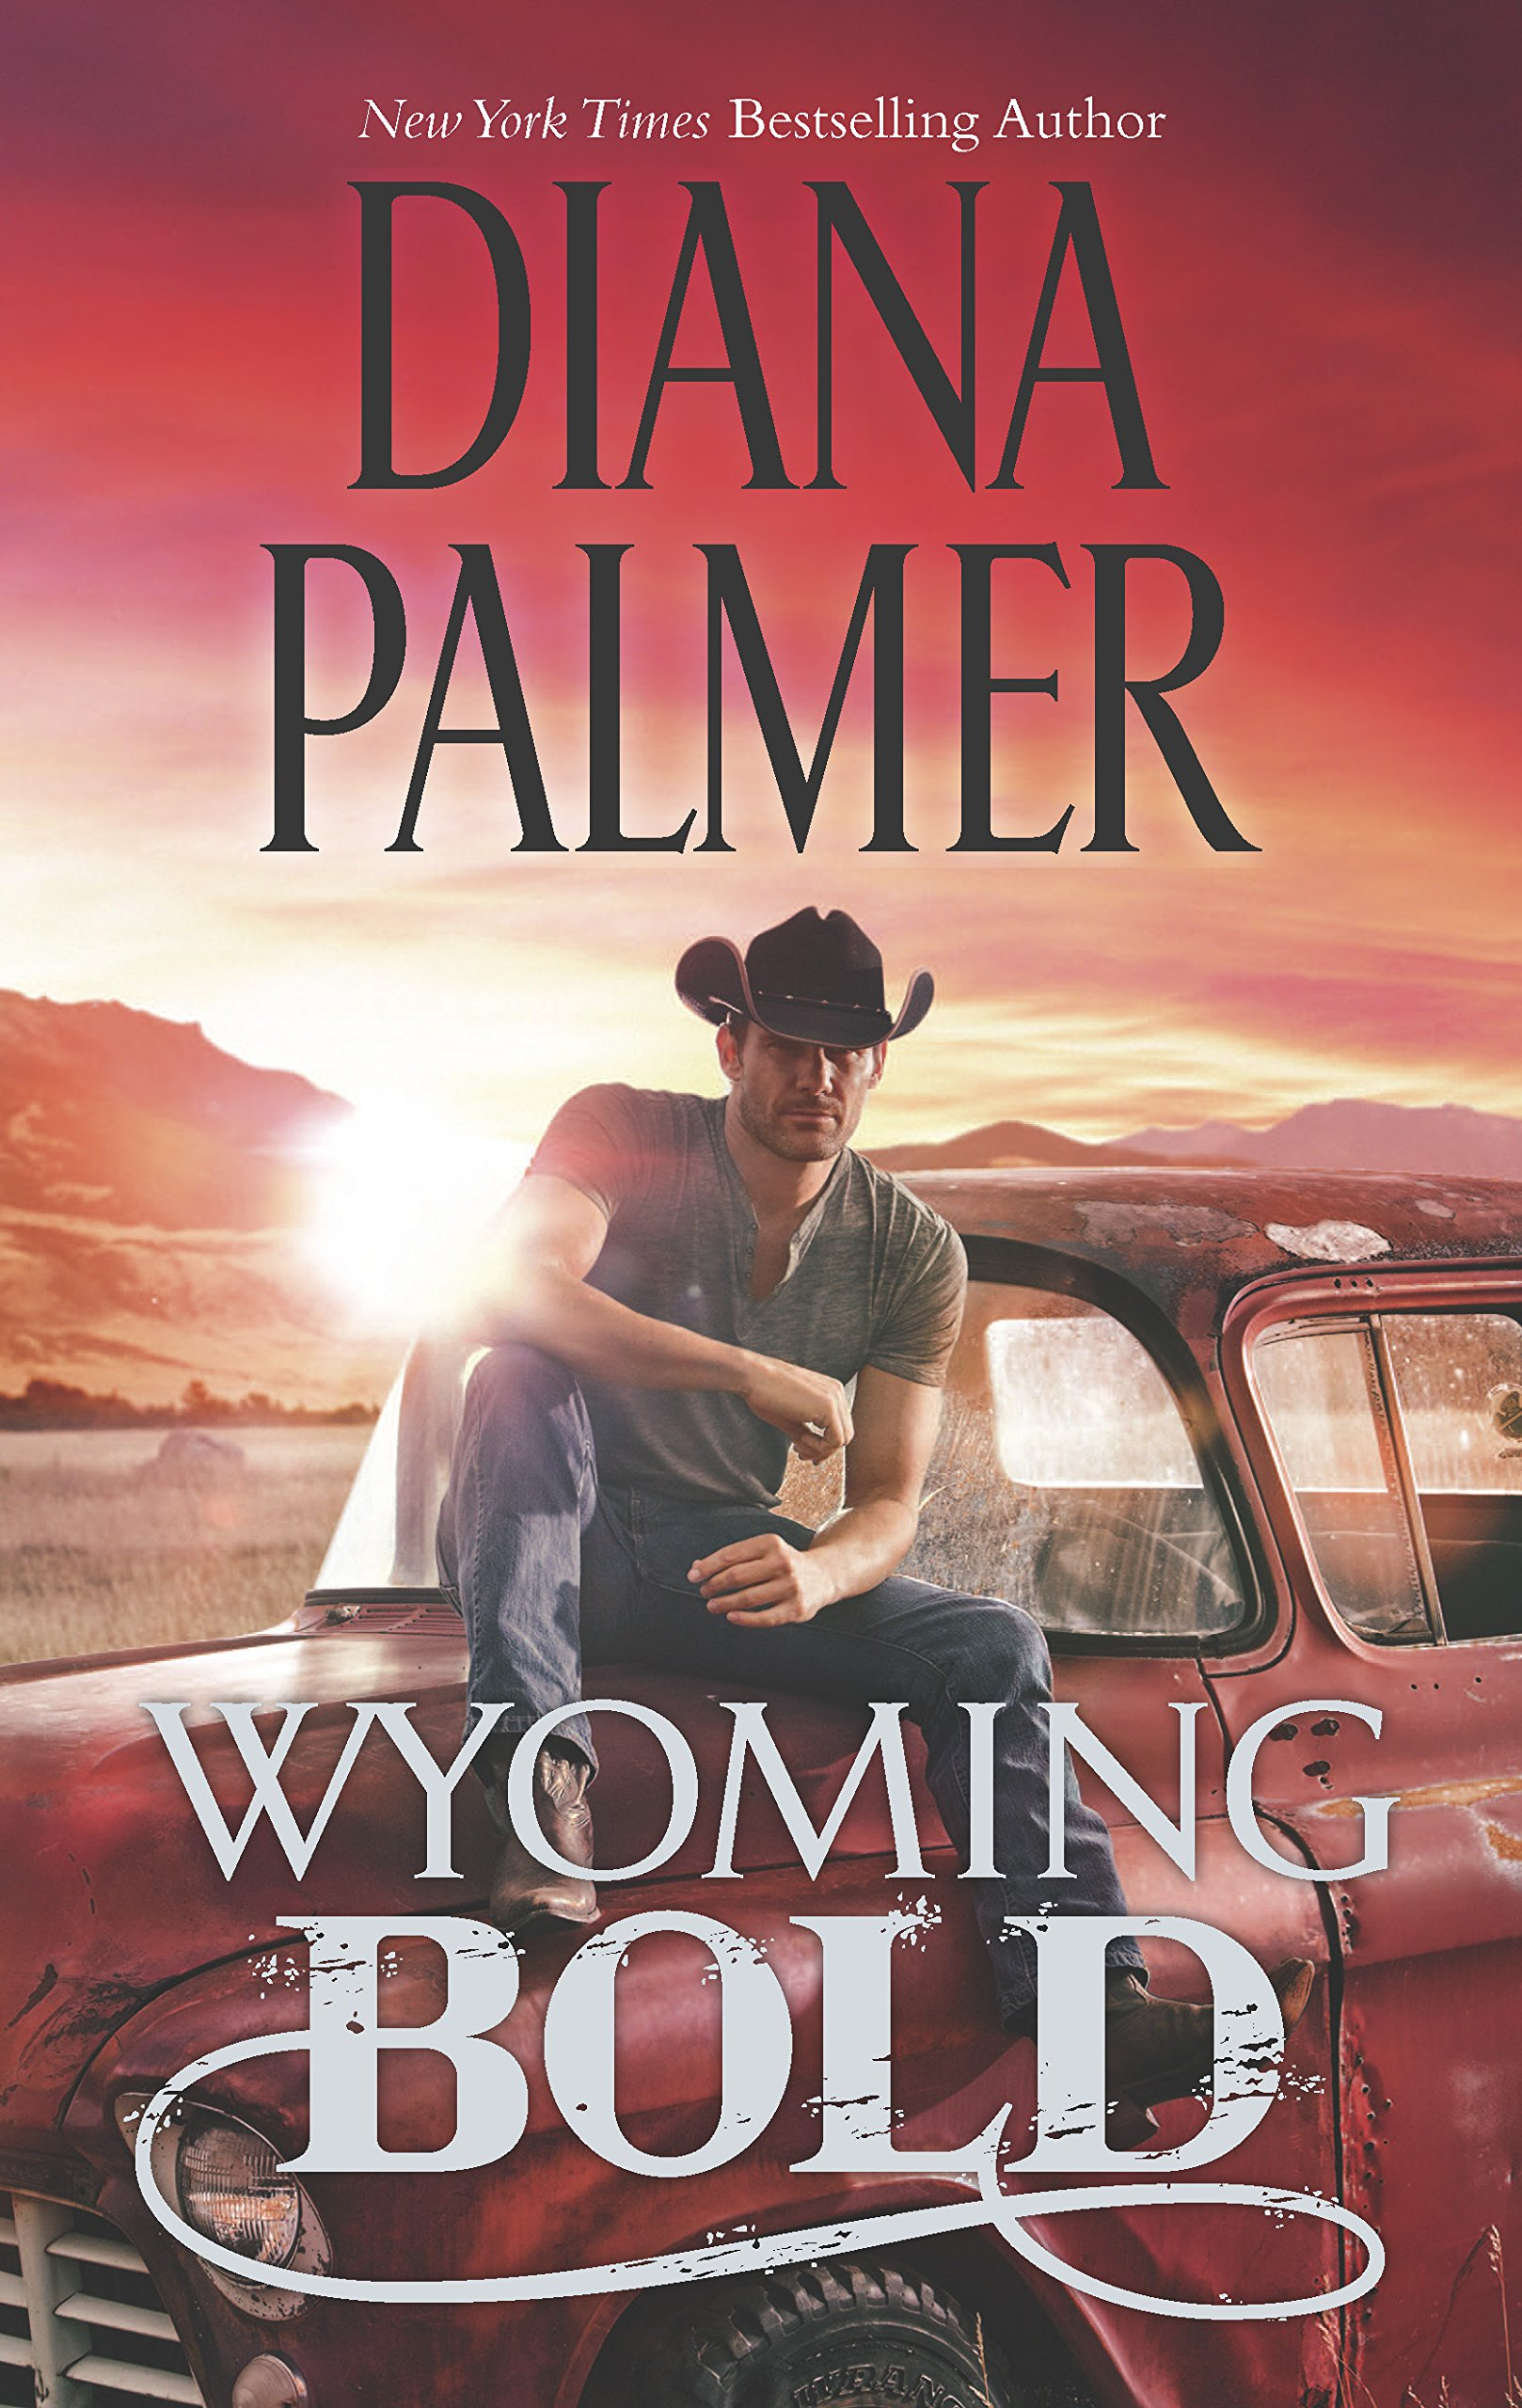 wyoming 24 7 america 24 7 state book series